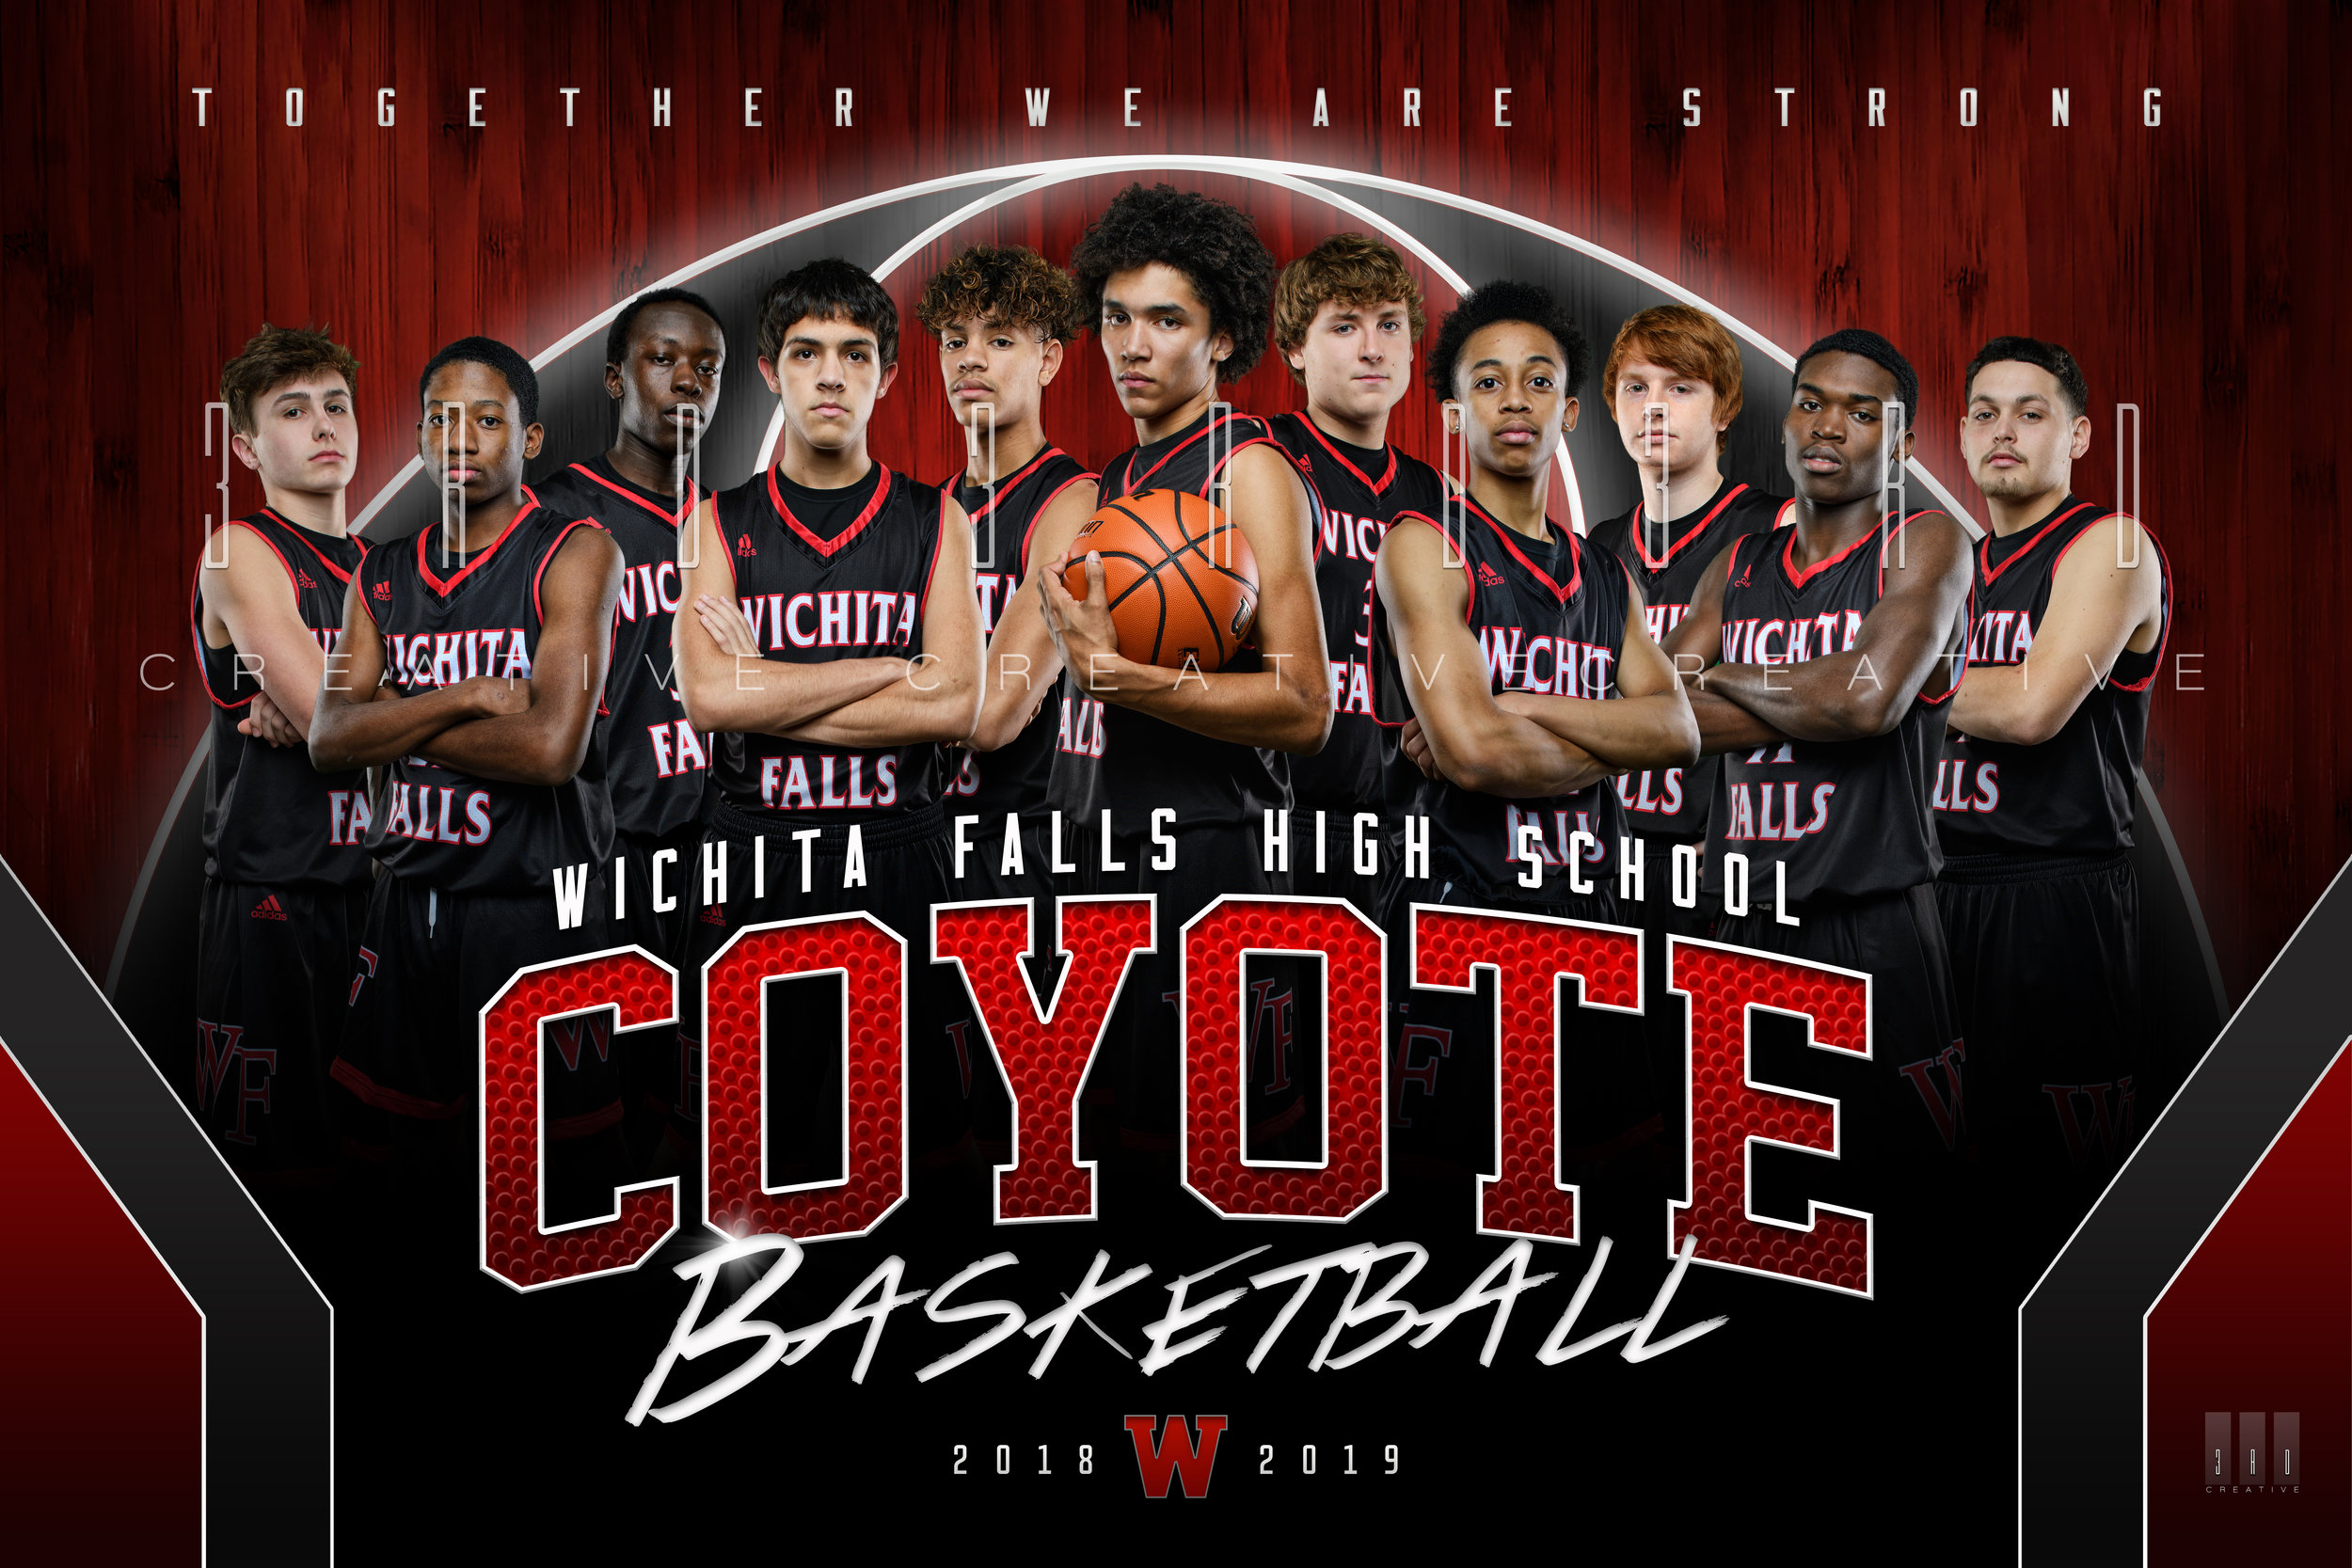 Coyotes_Horizontal_Red_Team.jpg